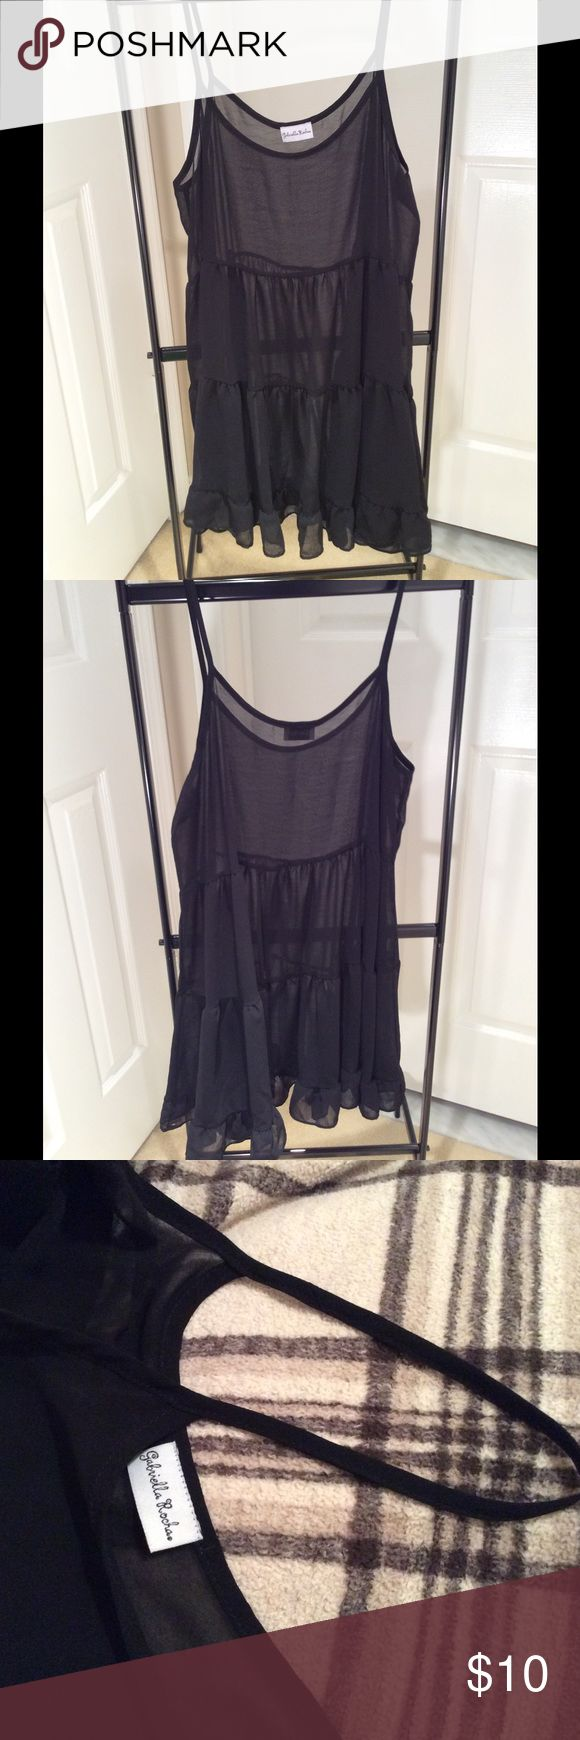 Gabriella Rocha Sheer Slip Dress Sheer slip dress. Worn once. Perfect shape. Gabriella Rocha Dresses